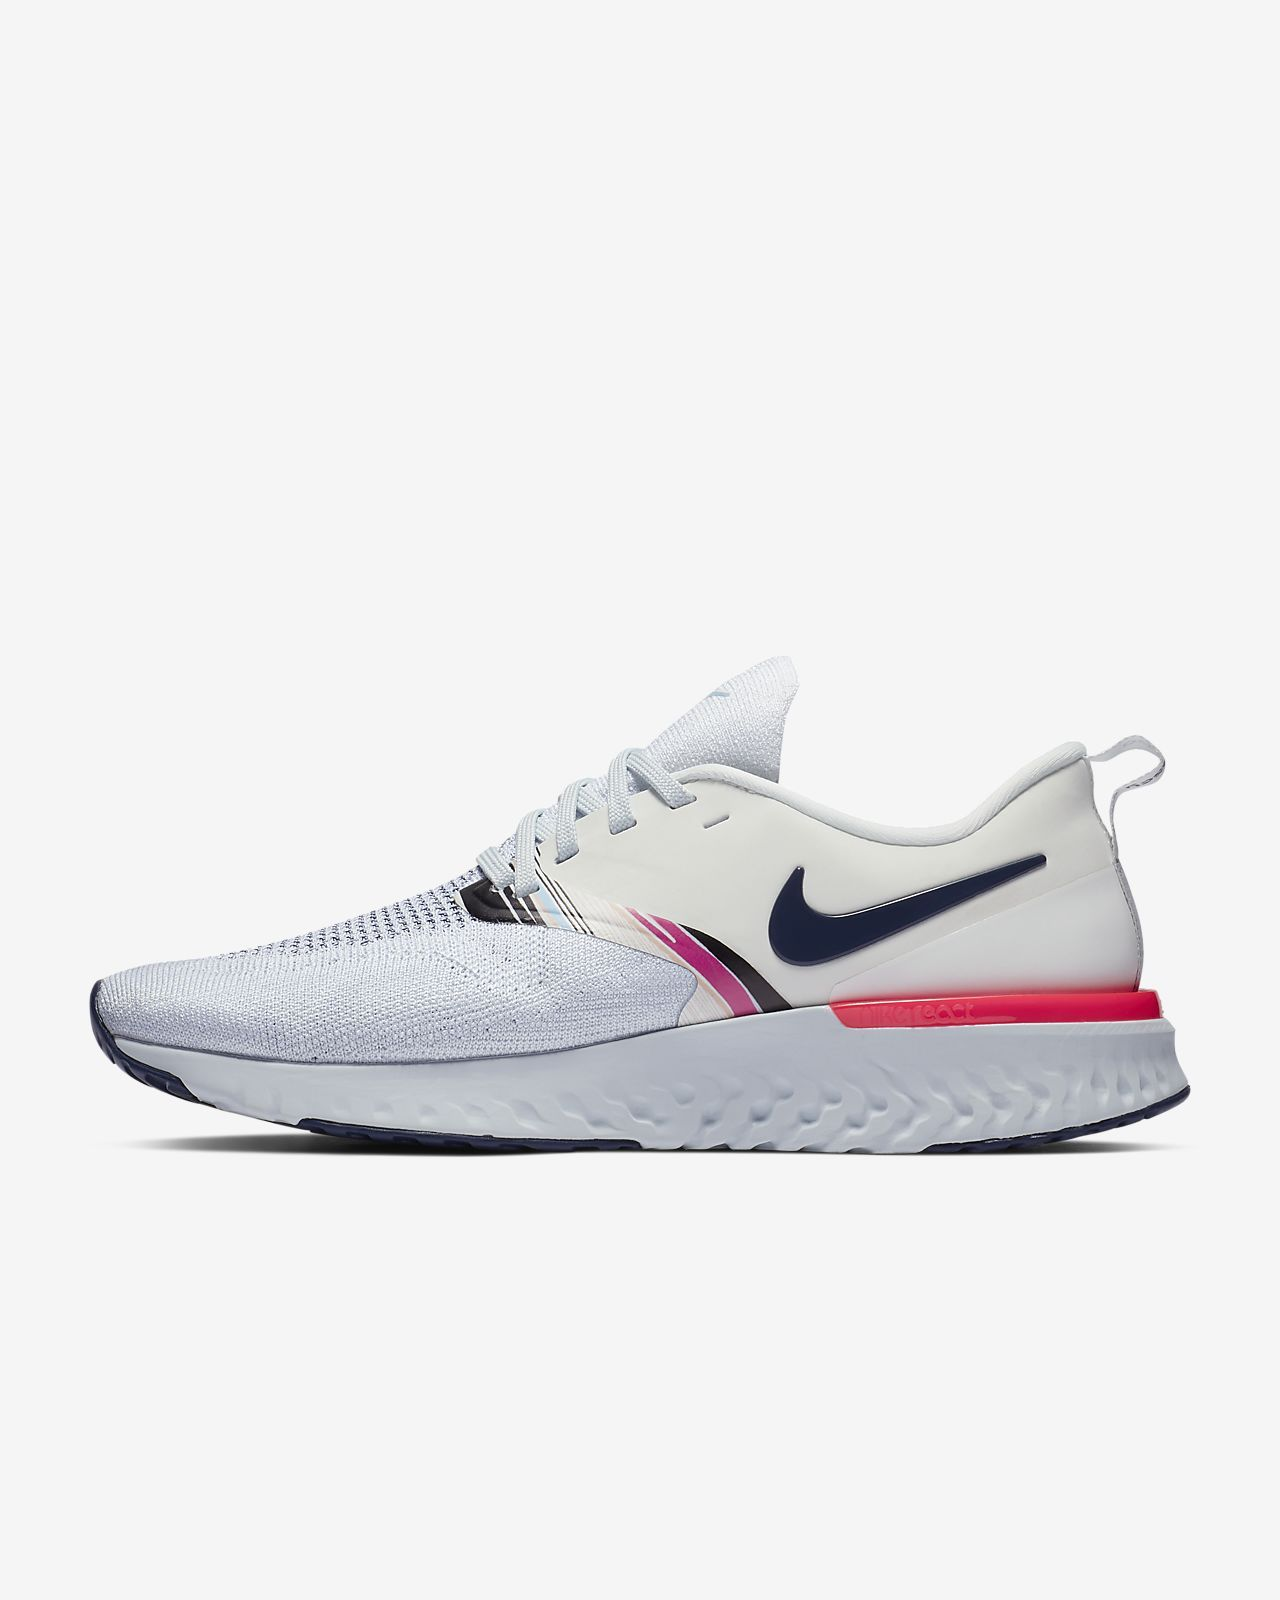 Nike Odyssey React Flyknit 2 Premium